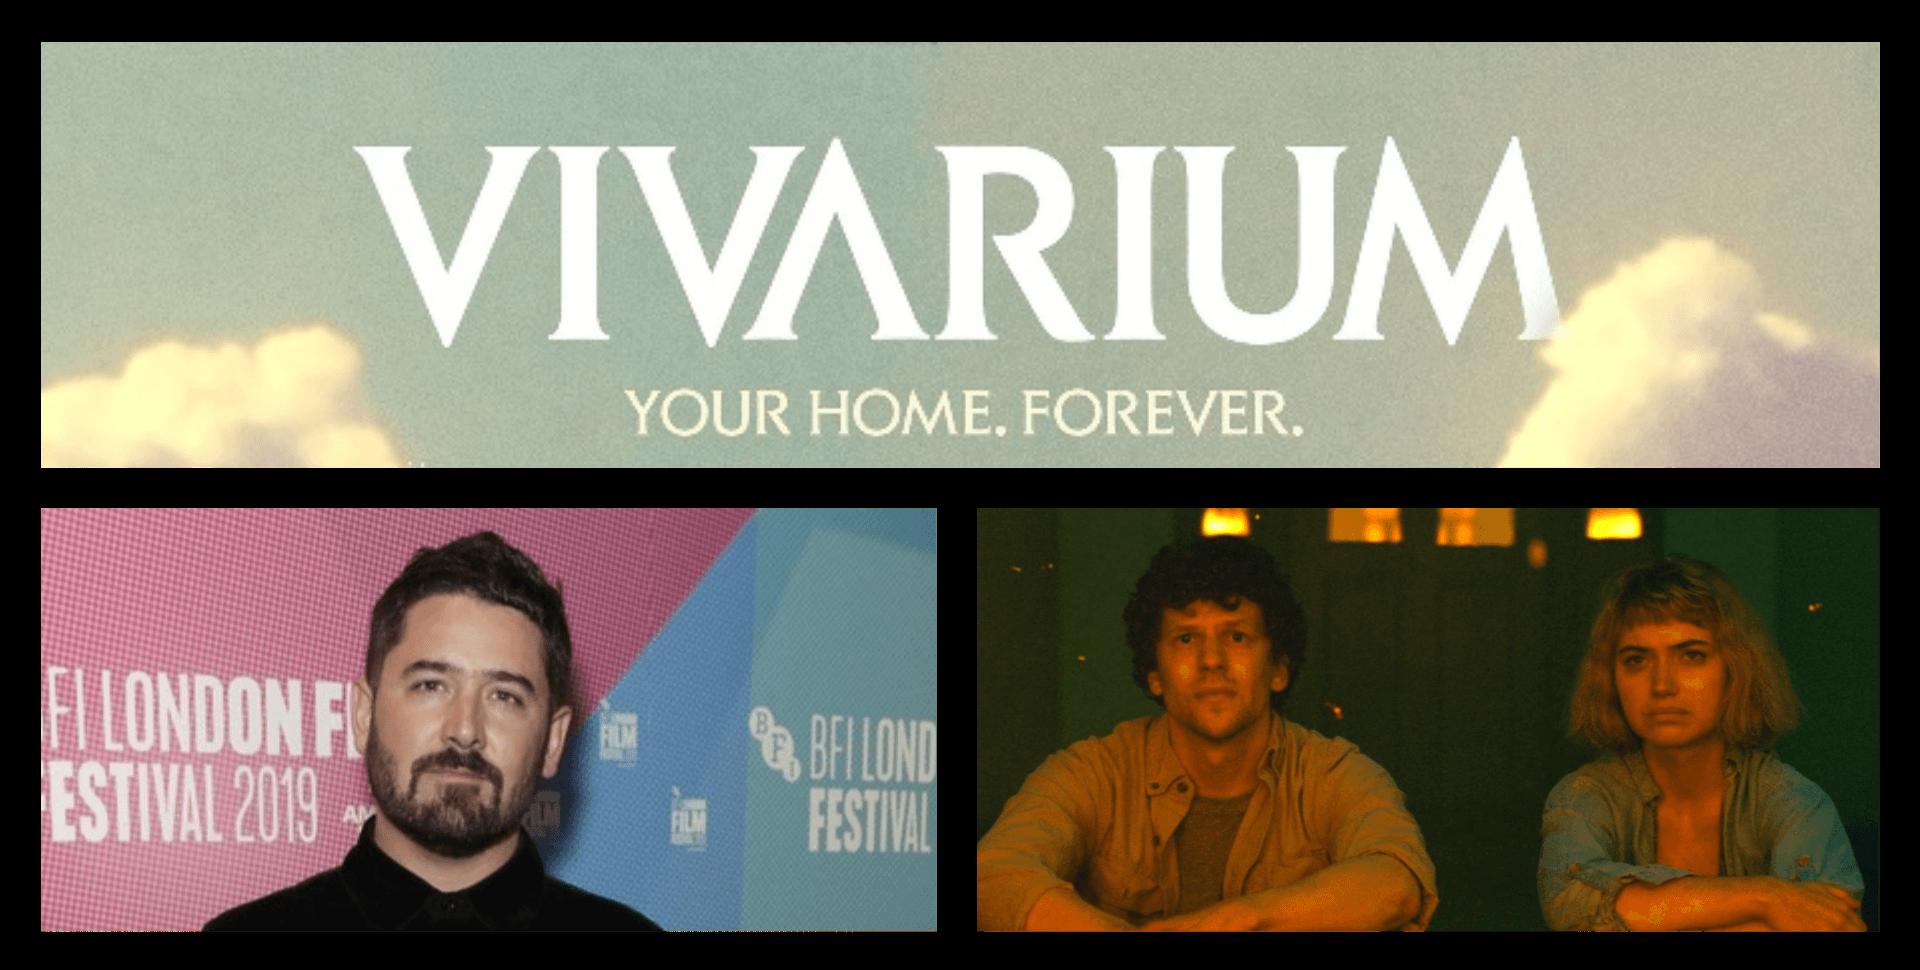 Interview with Vivarium director Lorcan Finnegan